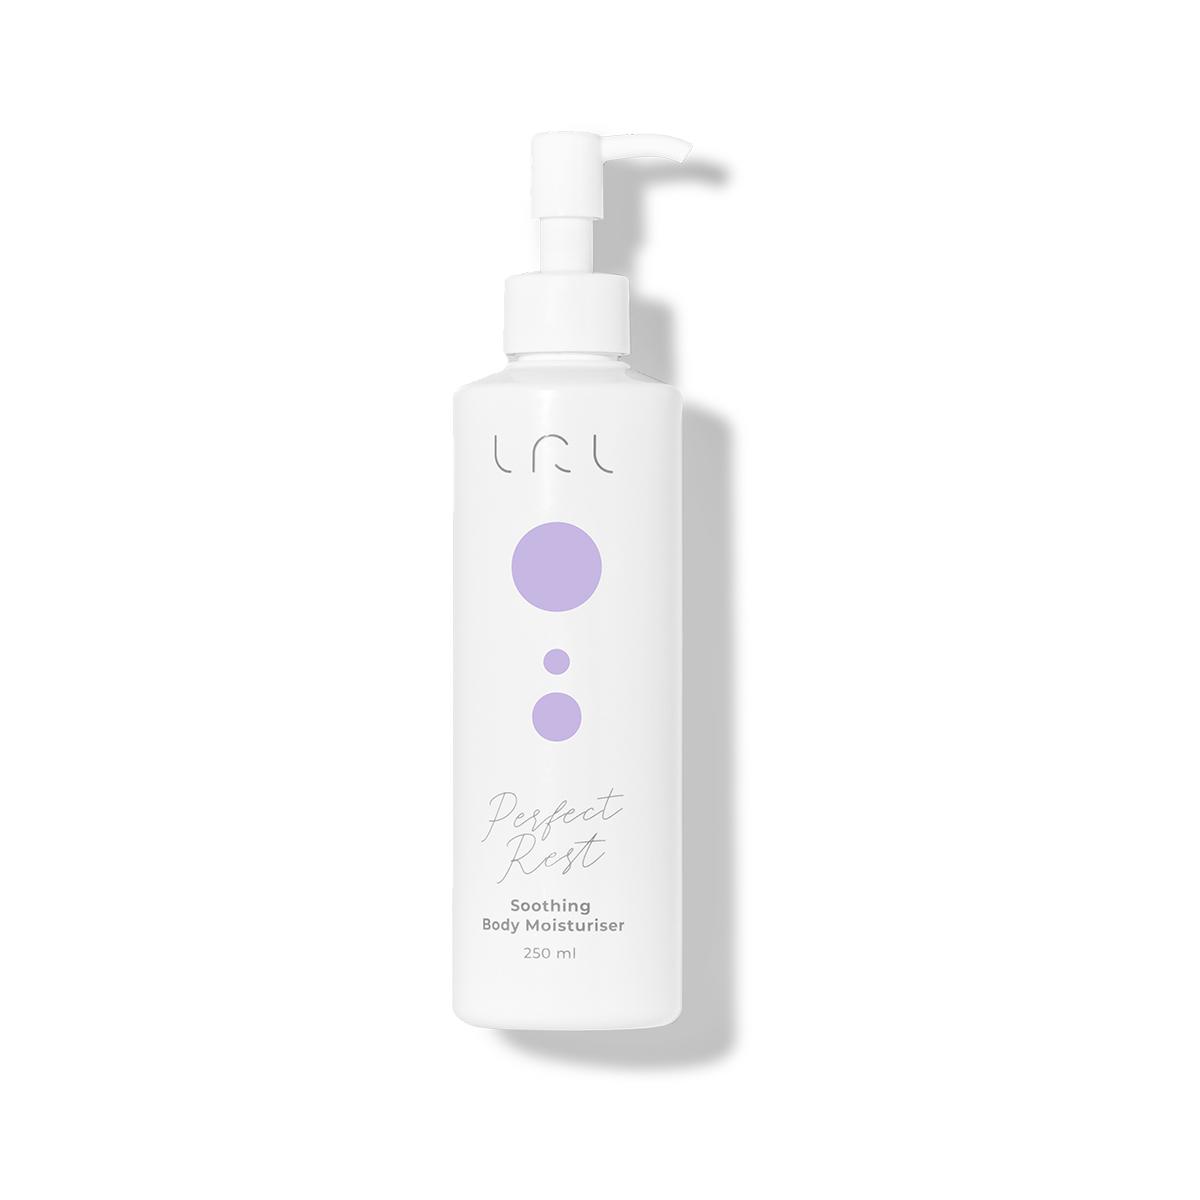 LRL_Perfect_rest_Soothing_body_moisturiser